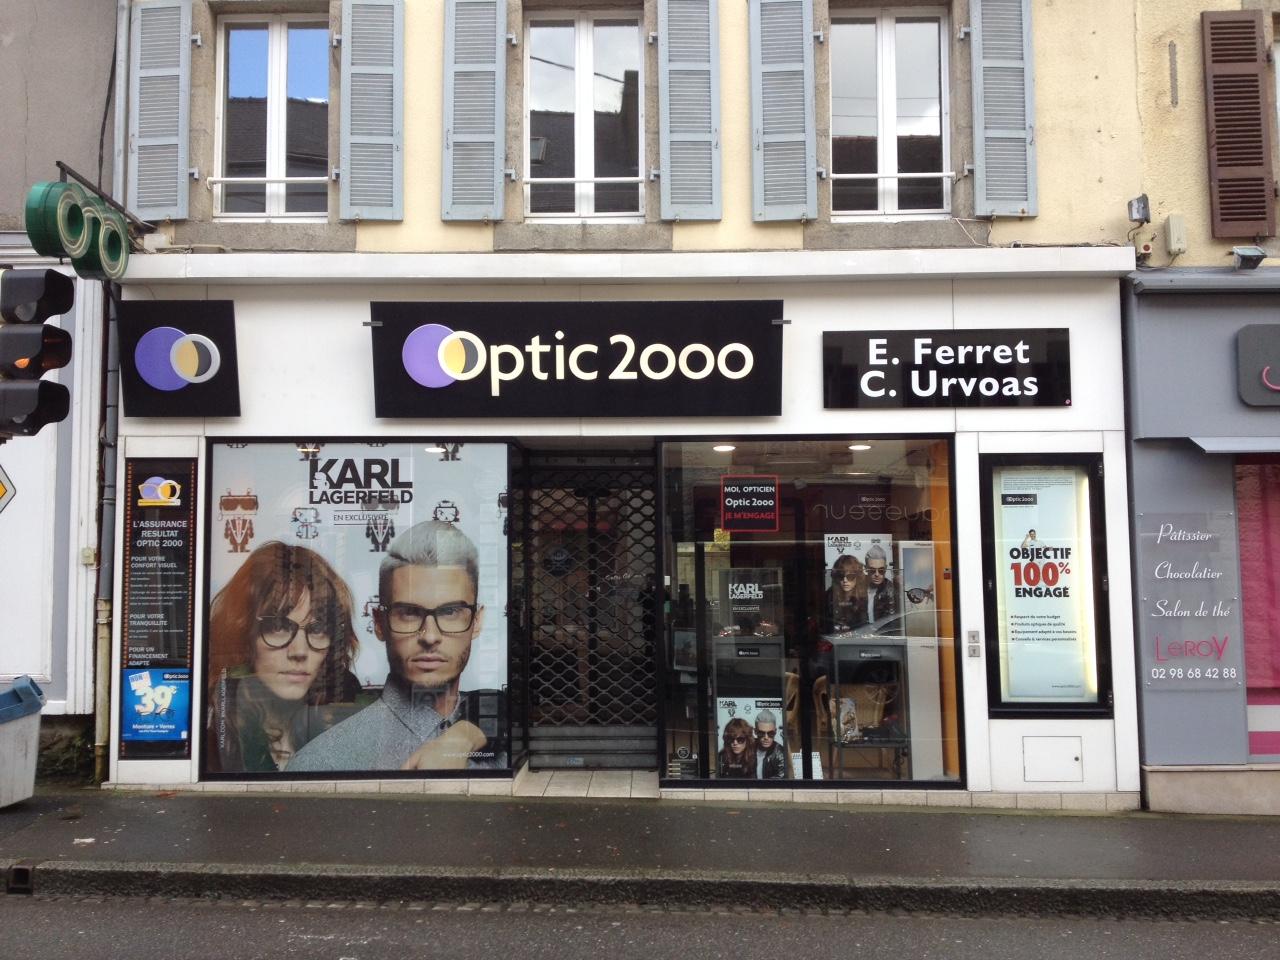 opticien landivisiau 29400 lunettes femme lunettes homme optic 2000. Black Bedroom Furniture Sets. Home Design Ideas